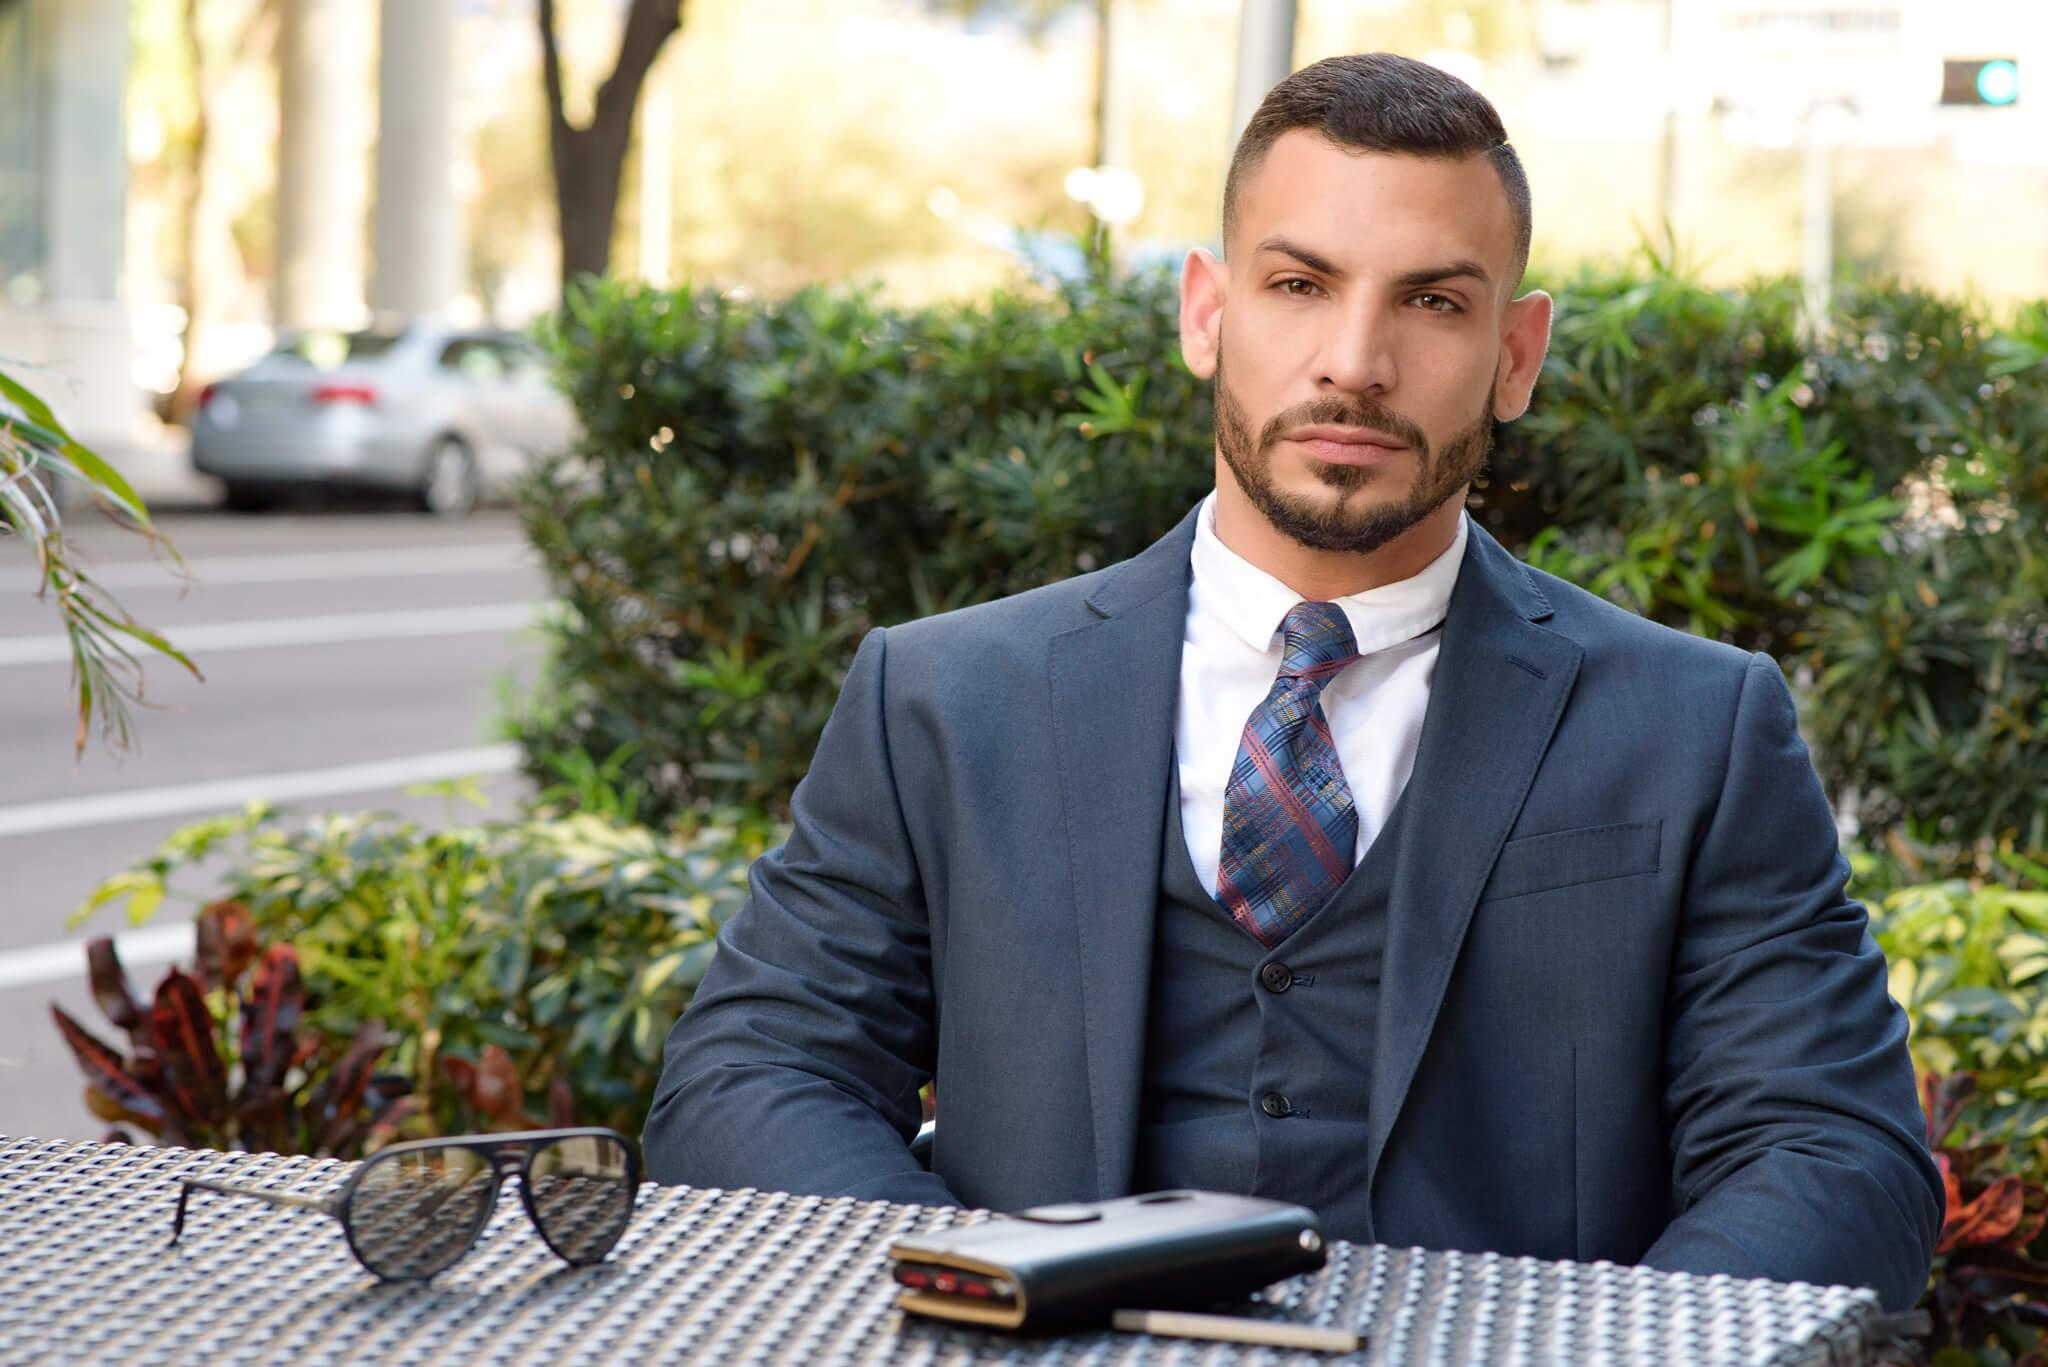 Alejandro's Business Lifestyle 2